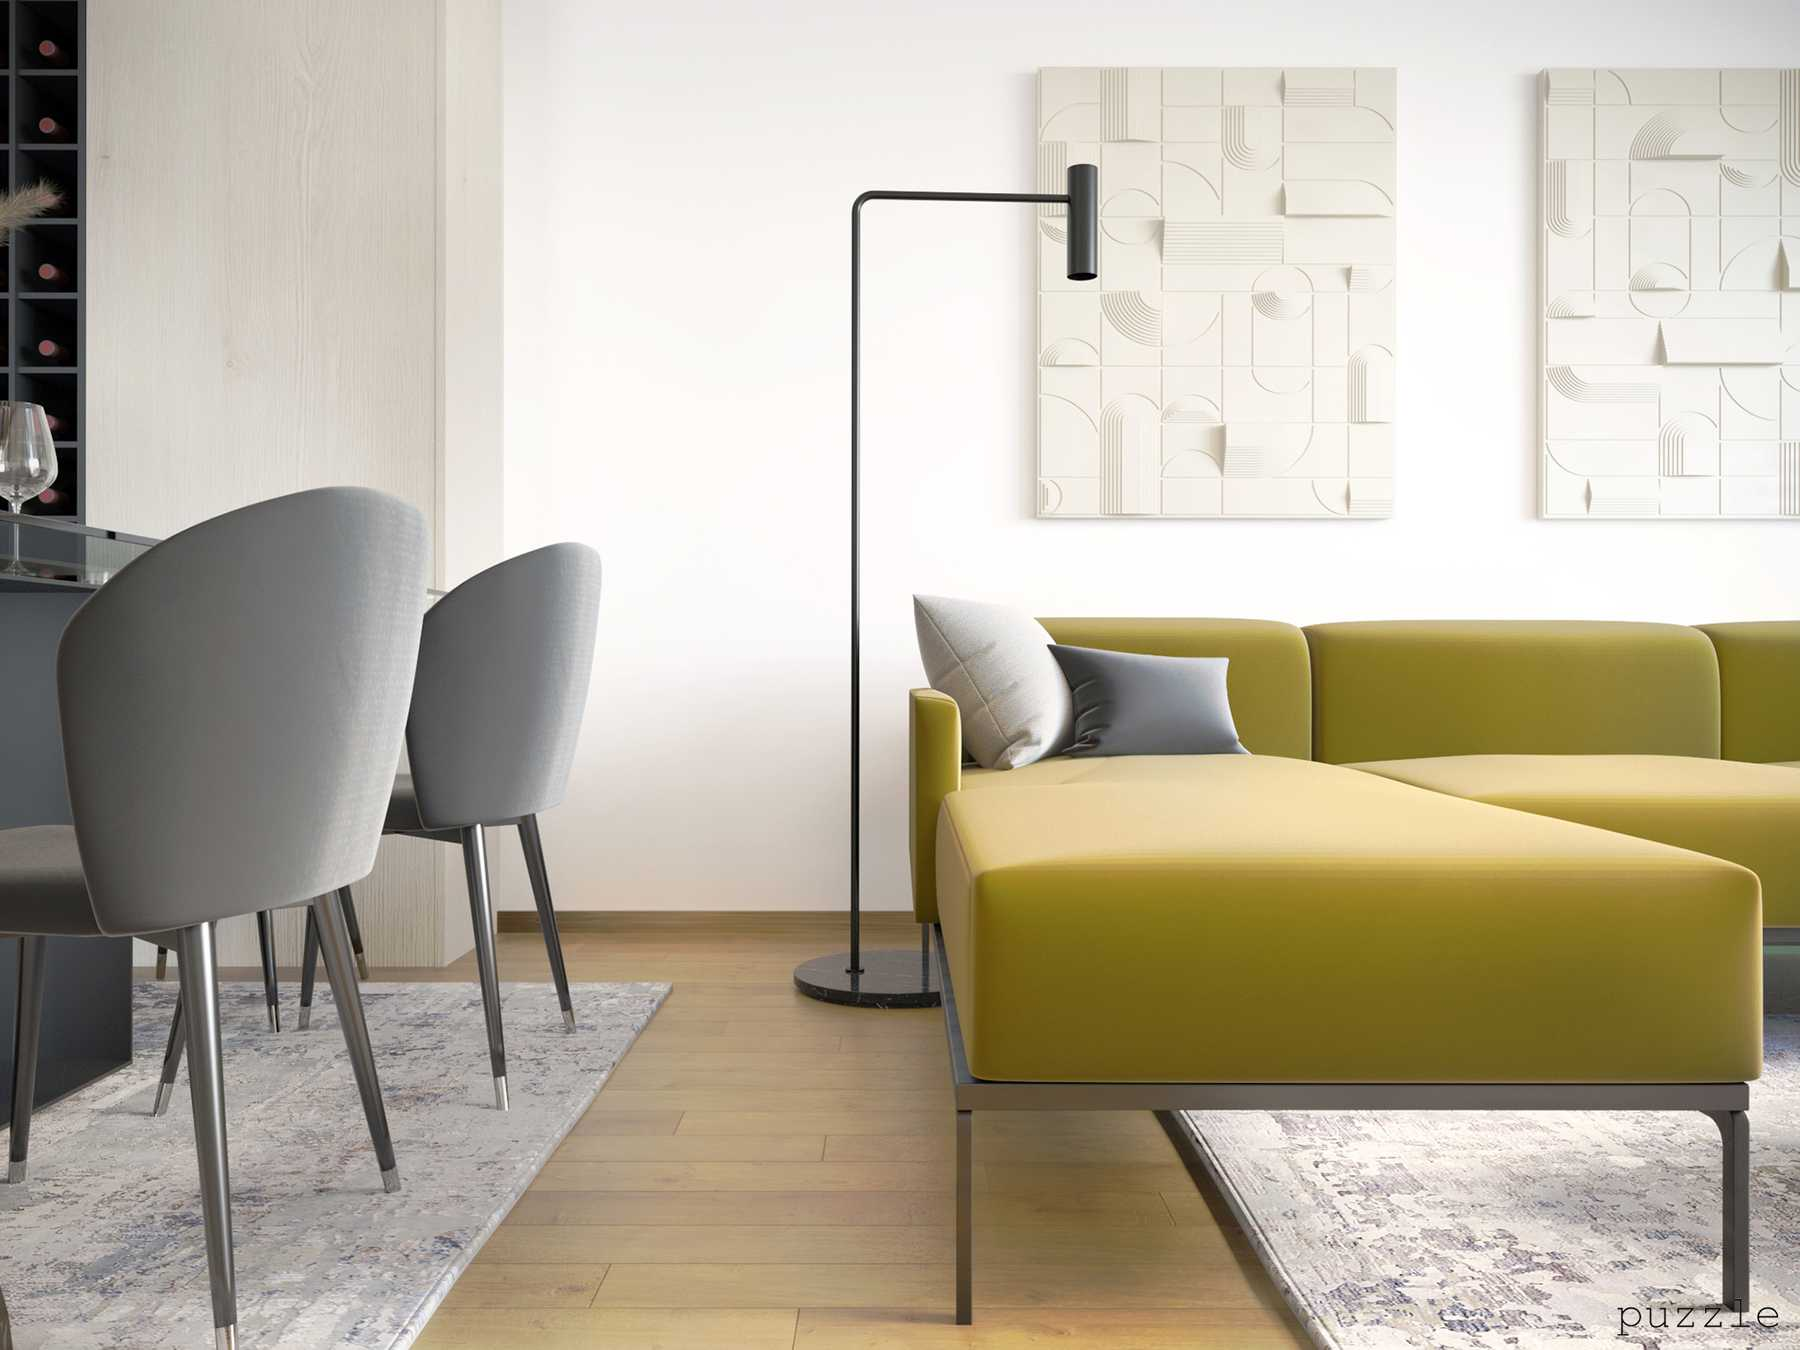 apartment-mg-10.jpg